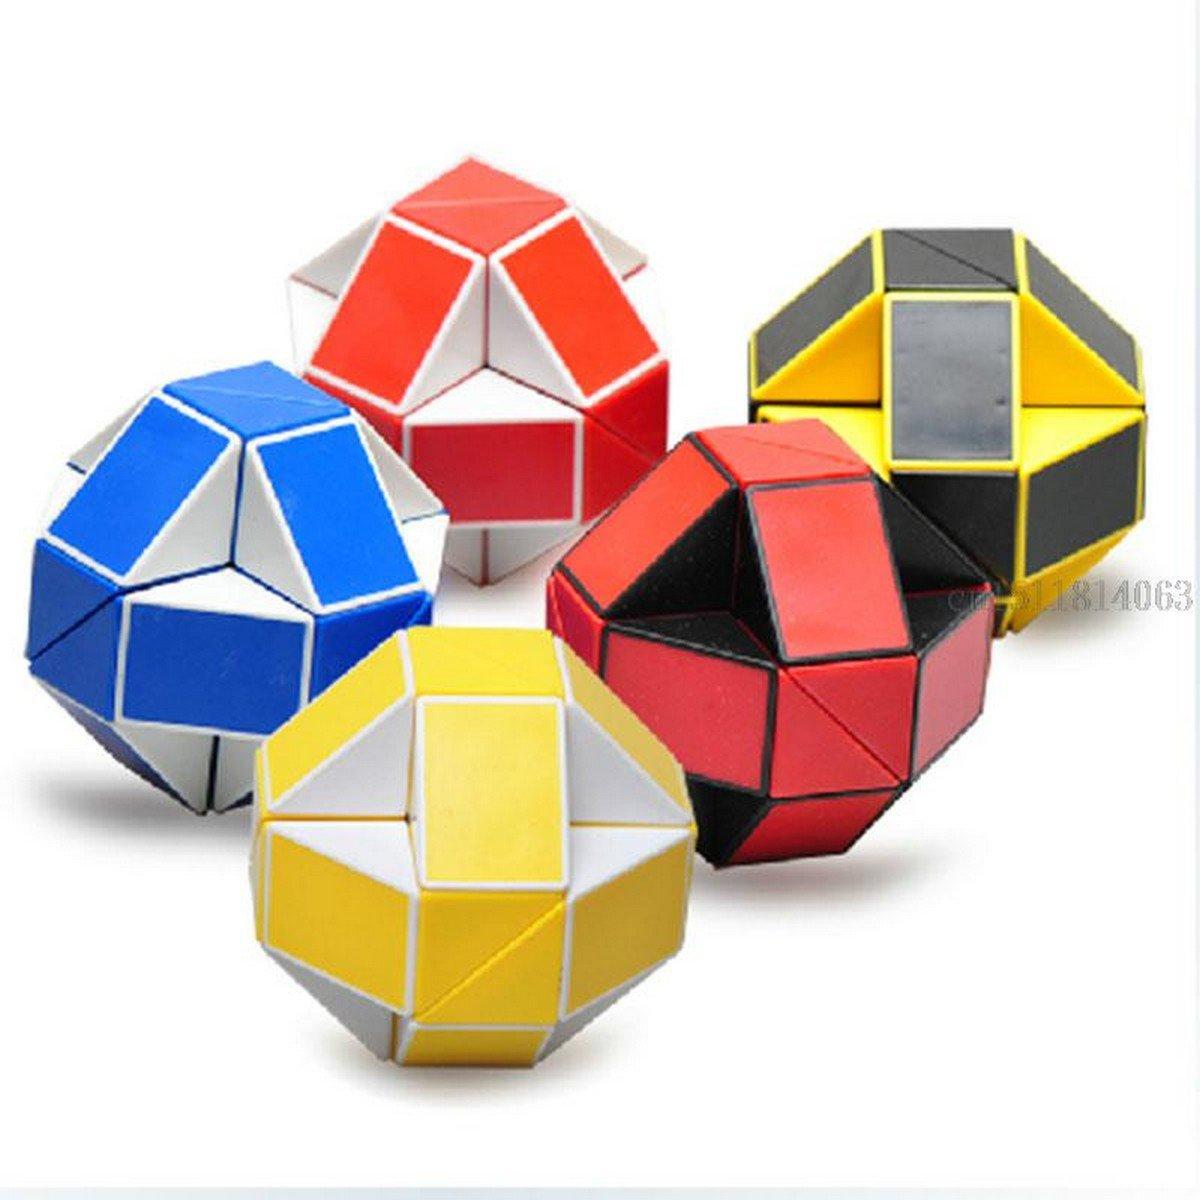 Buy 24 Blocks Shengshou Magic Cube Puzzle Strange shape Magic Ruler 3D Snake Toys Children Educatio